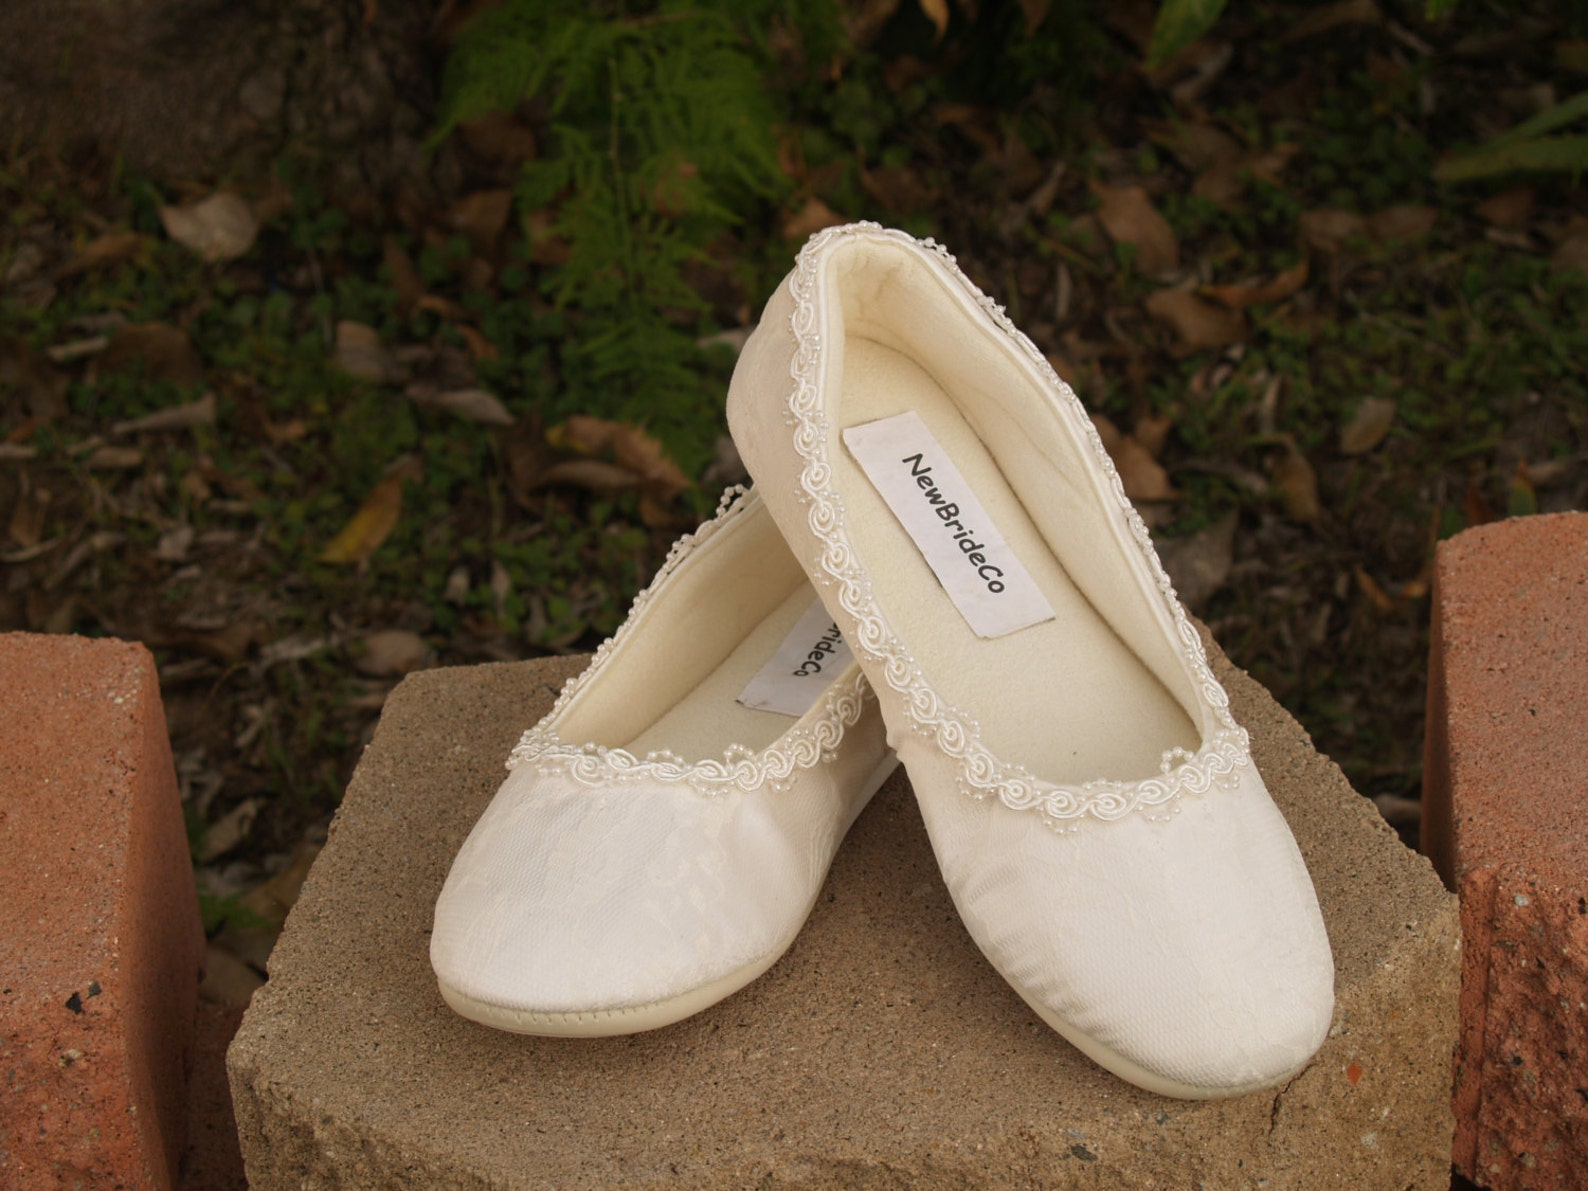 ivory vegan bridal flats comfortable shoes w pearls flower appliqué,wedding flats ivory rose,ballet style slipper,comfortable re